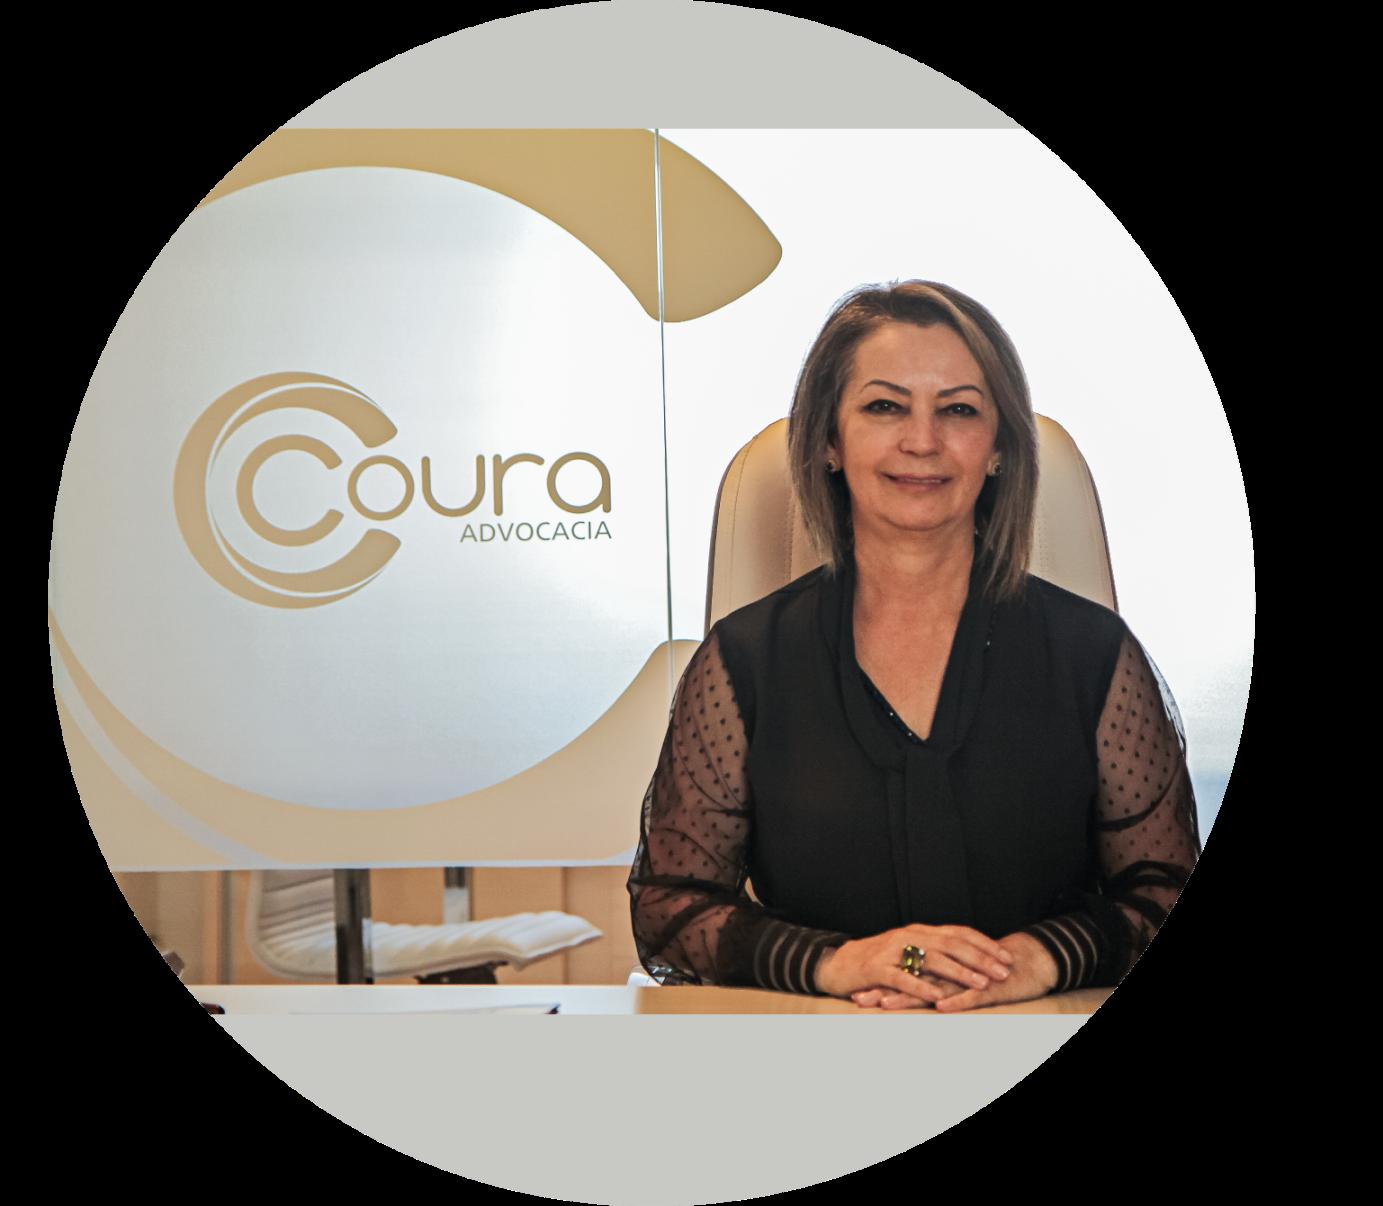 Iliane Maria Coura